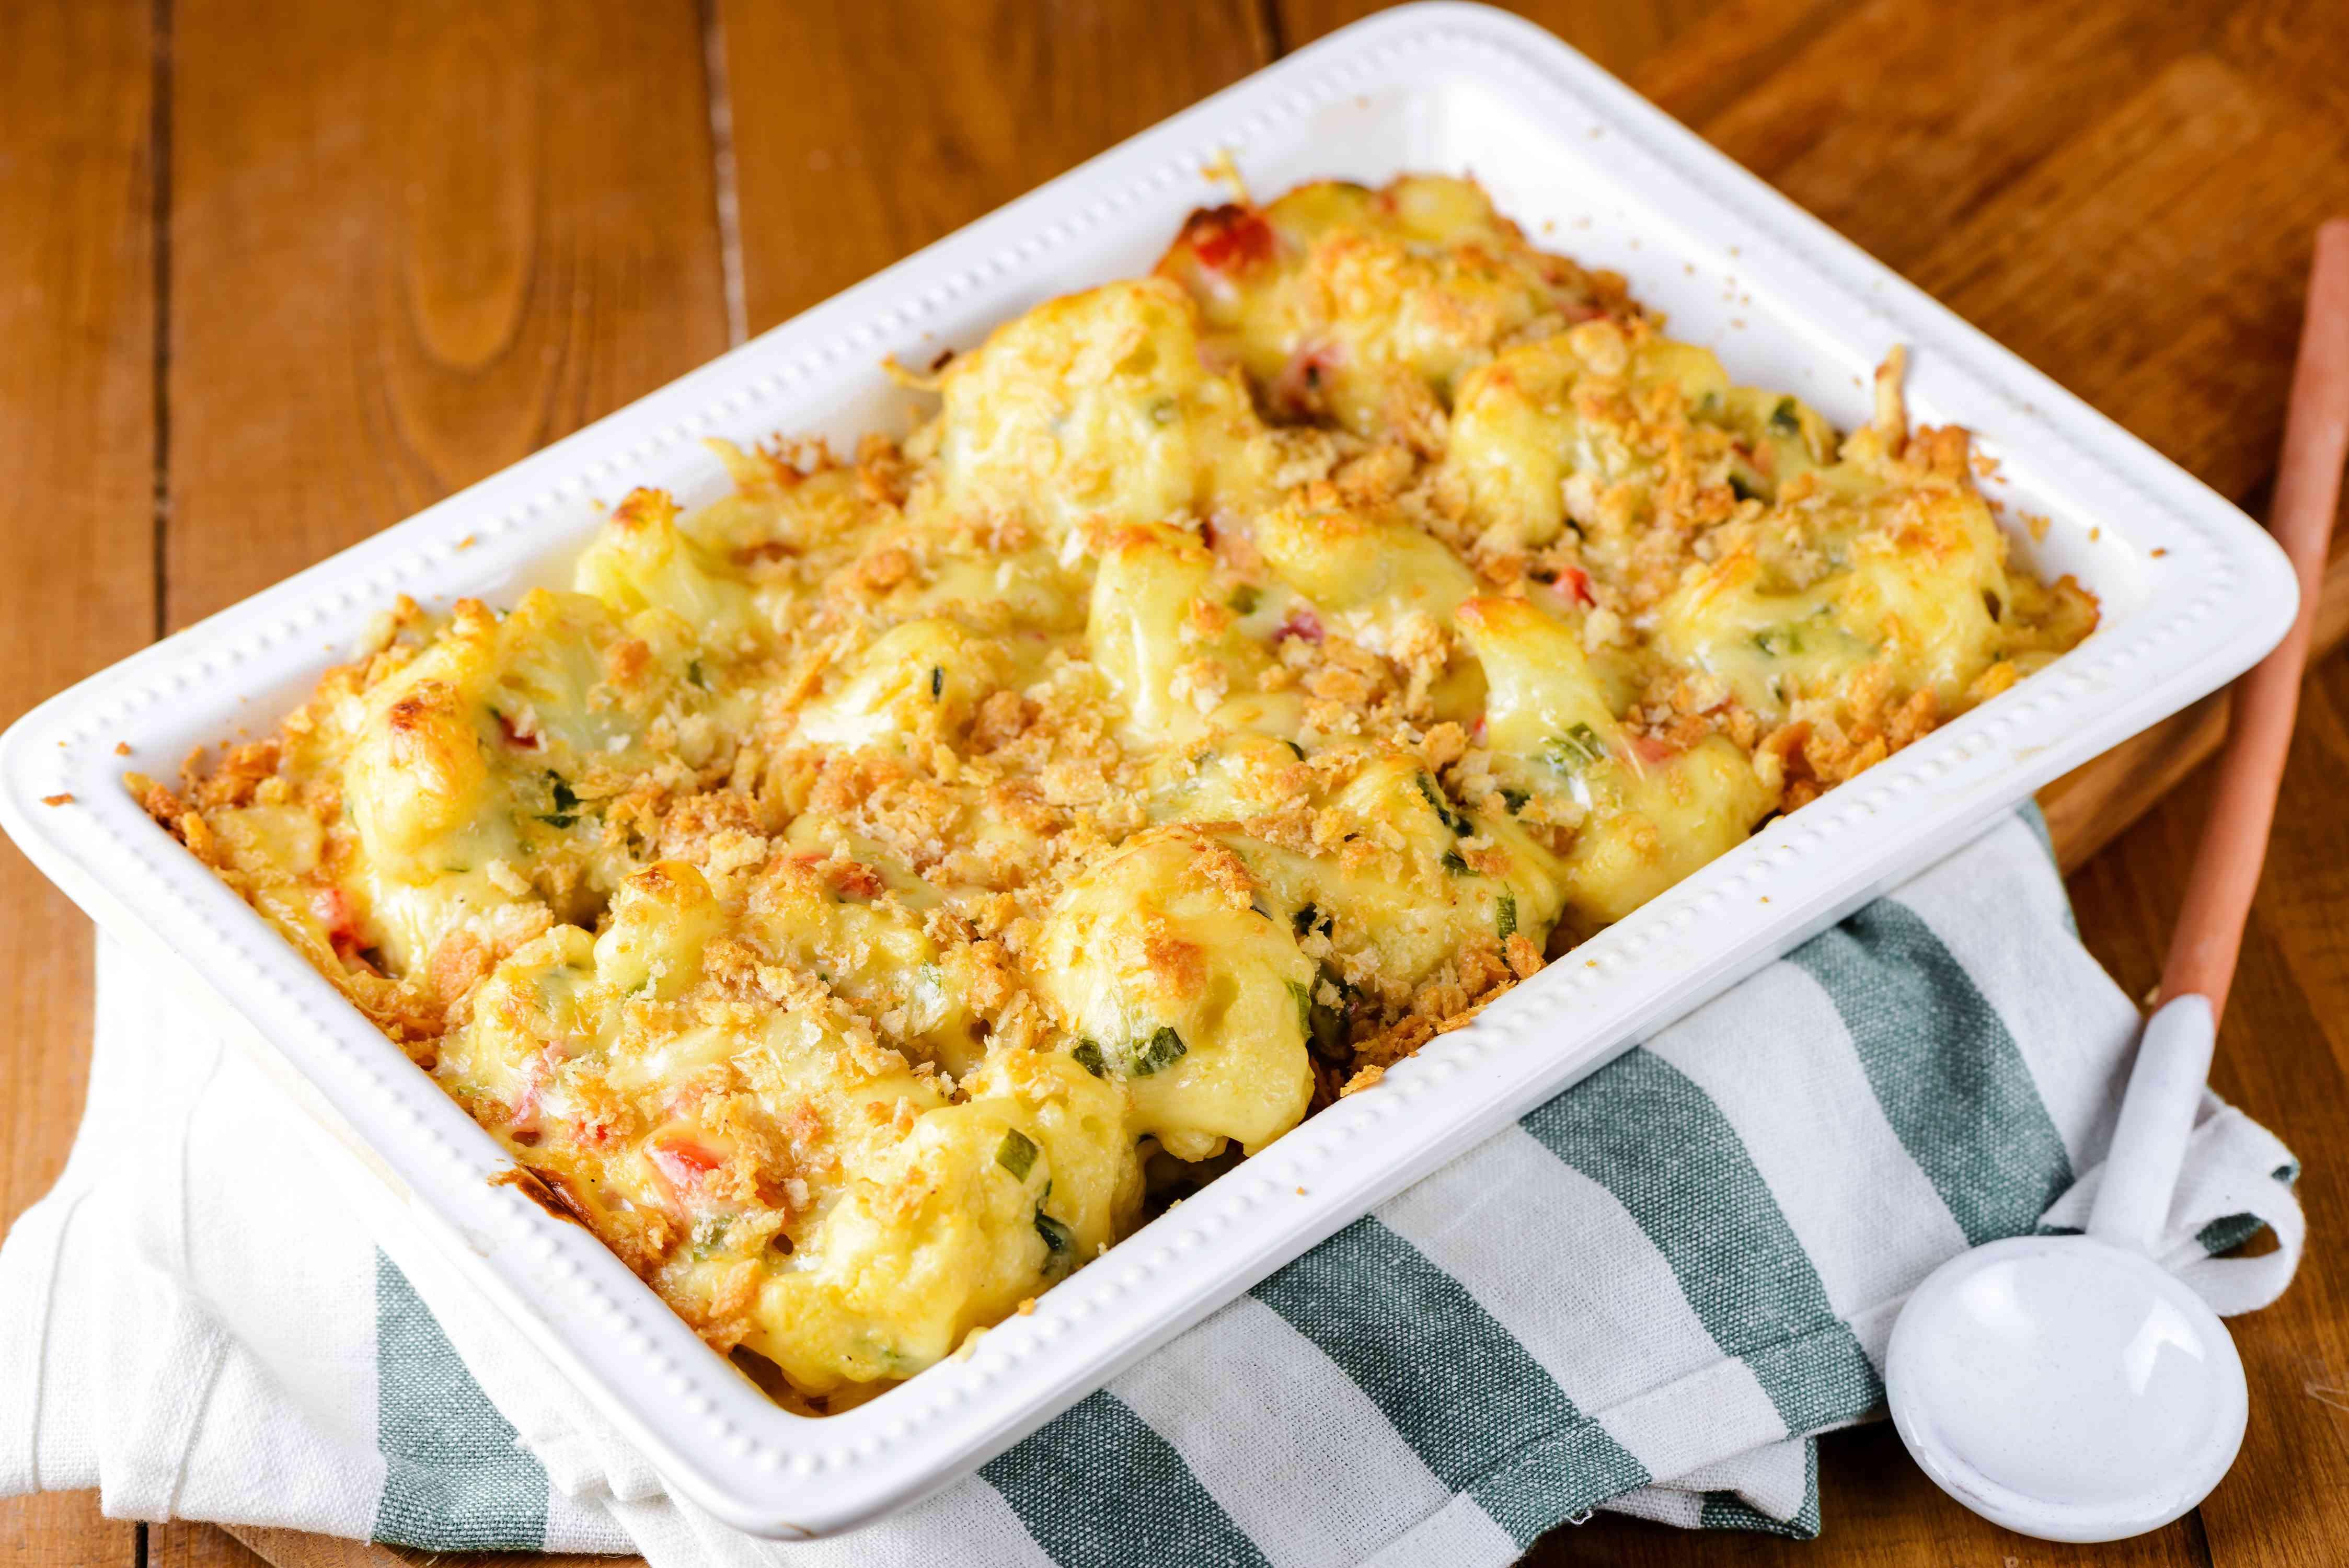 Cauliflower casserole recipe